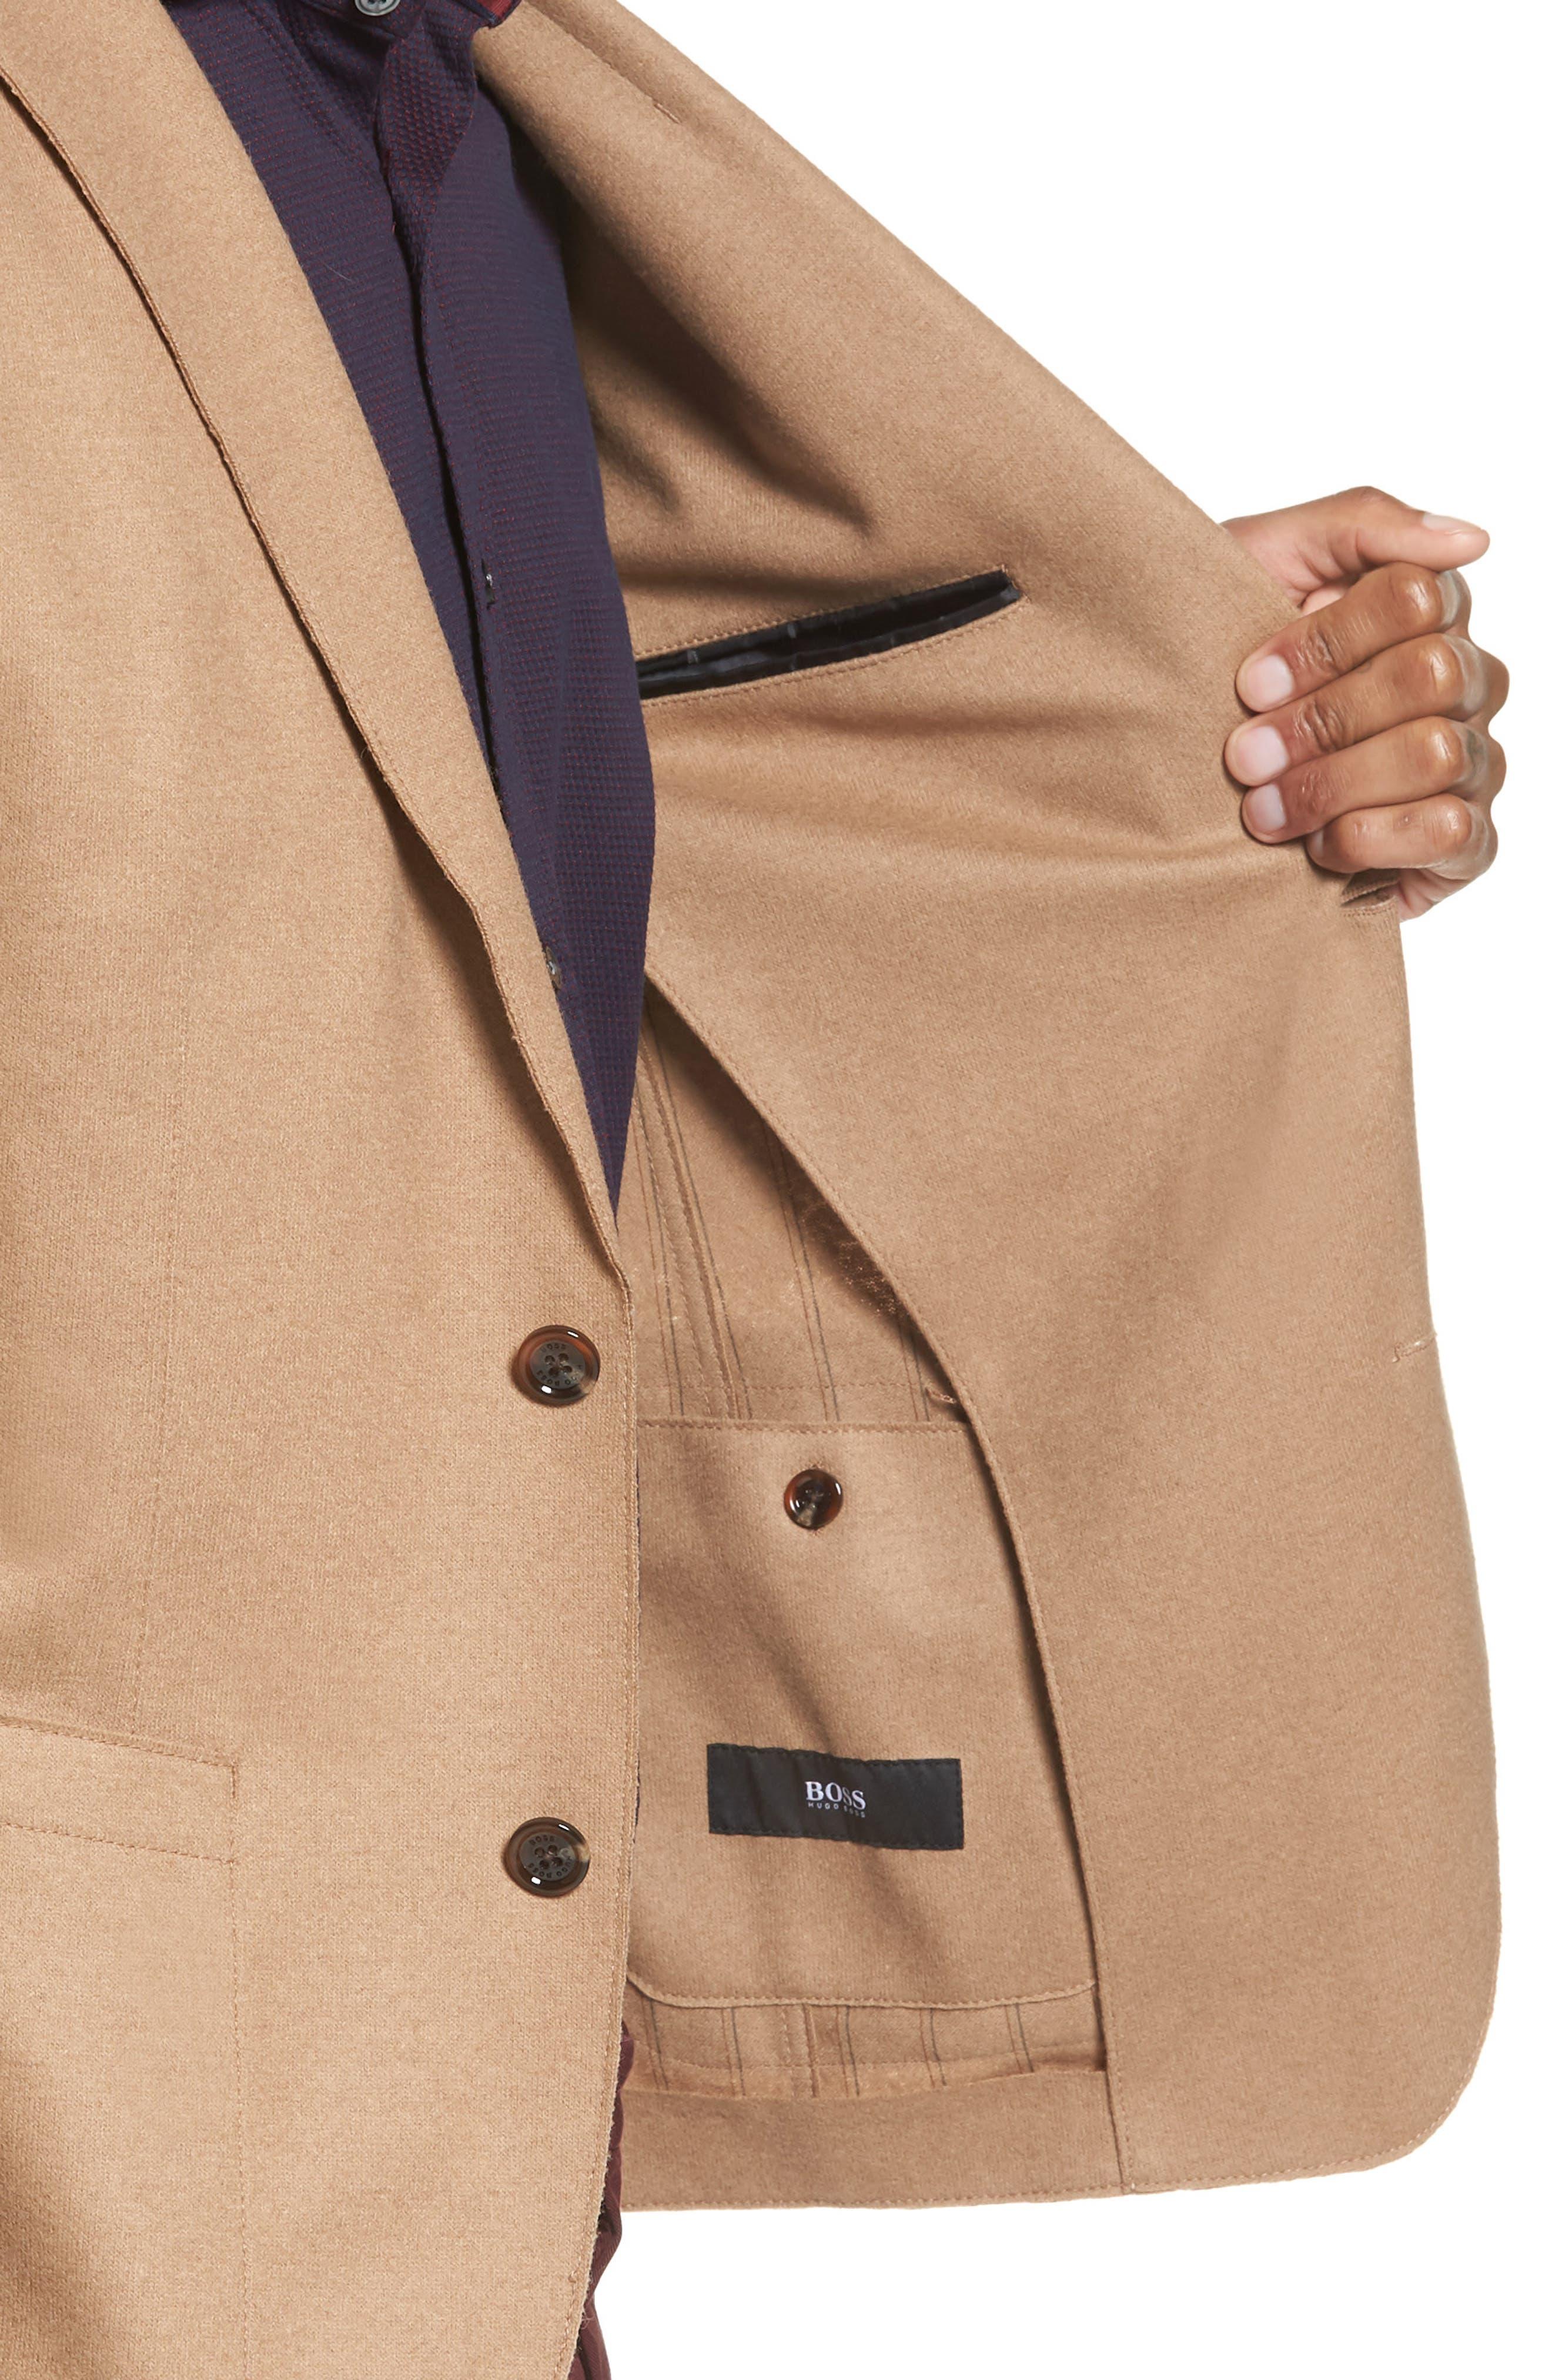 Nordin Trim Fit Virgin Wool Sport Coat,                             Alternate thumbnail 3, color,                             262